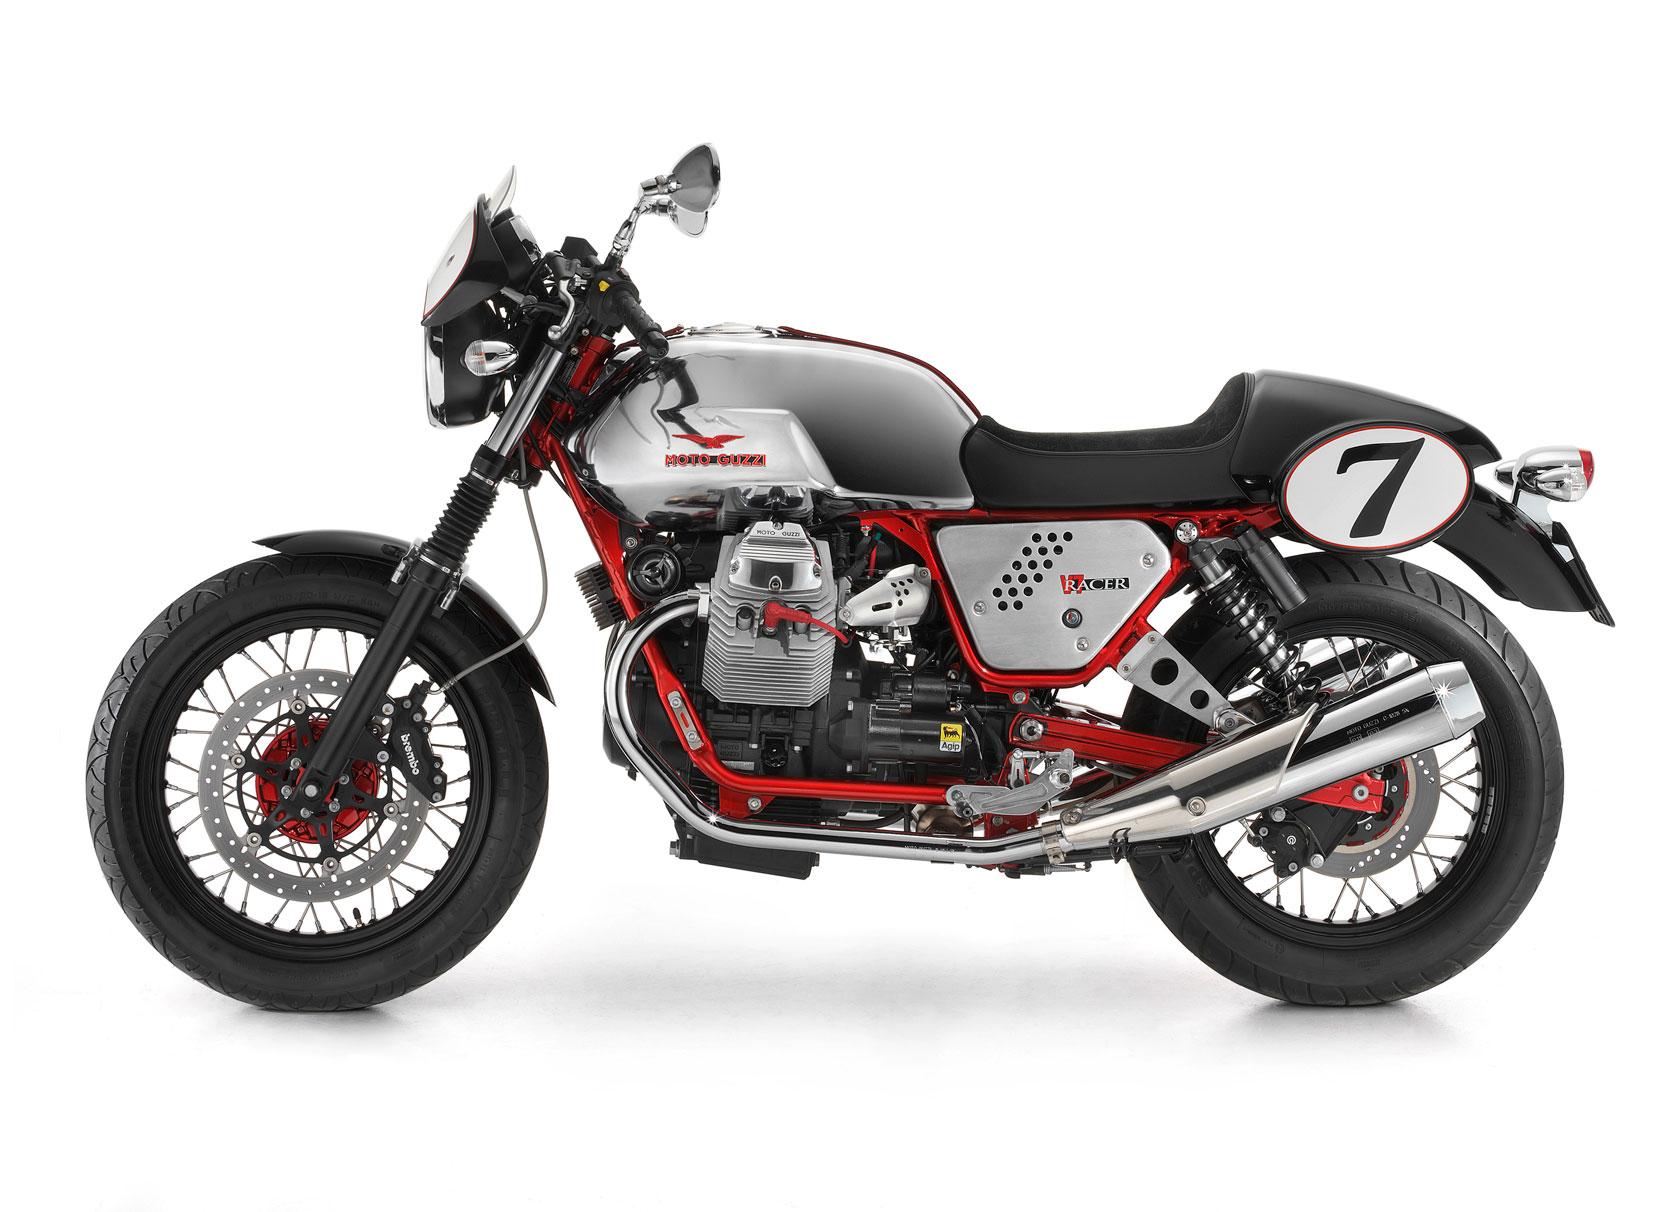 moto guzzi v7 racer specs 2010 2011 autoevolution. Black Bedroom Furniture Sets. Home Design Ideas